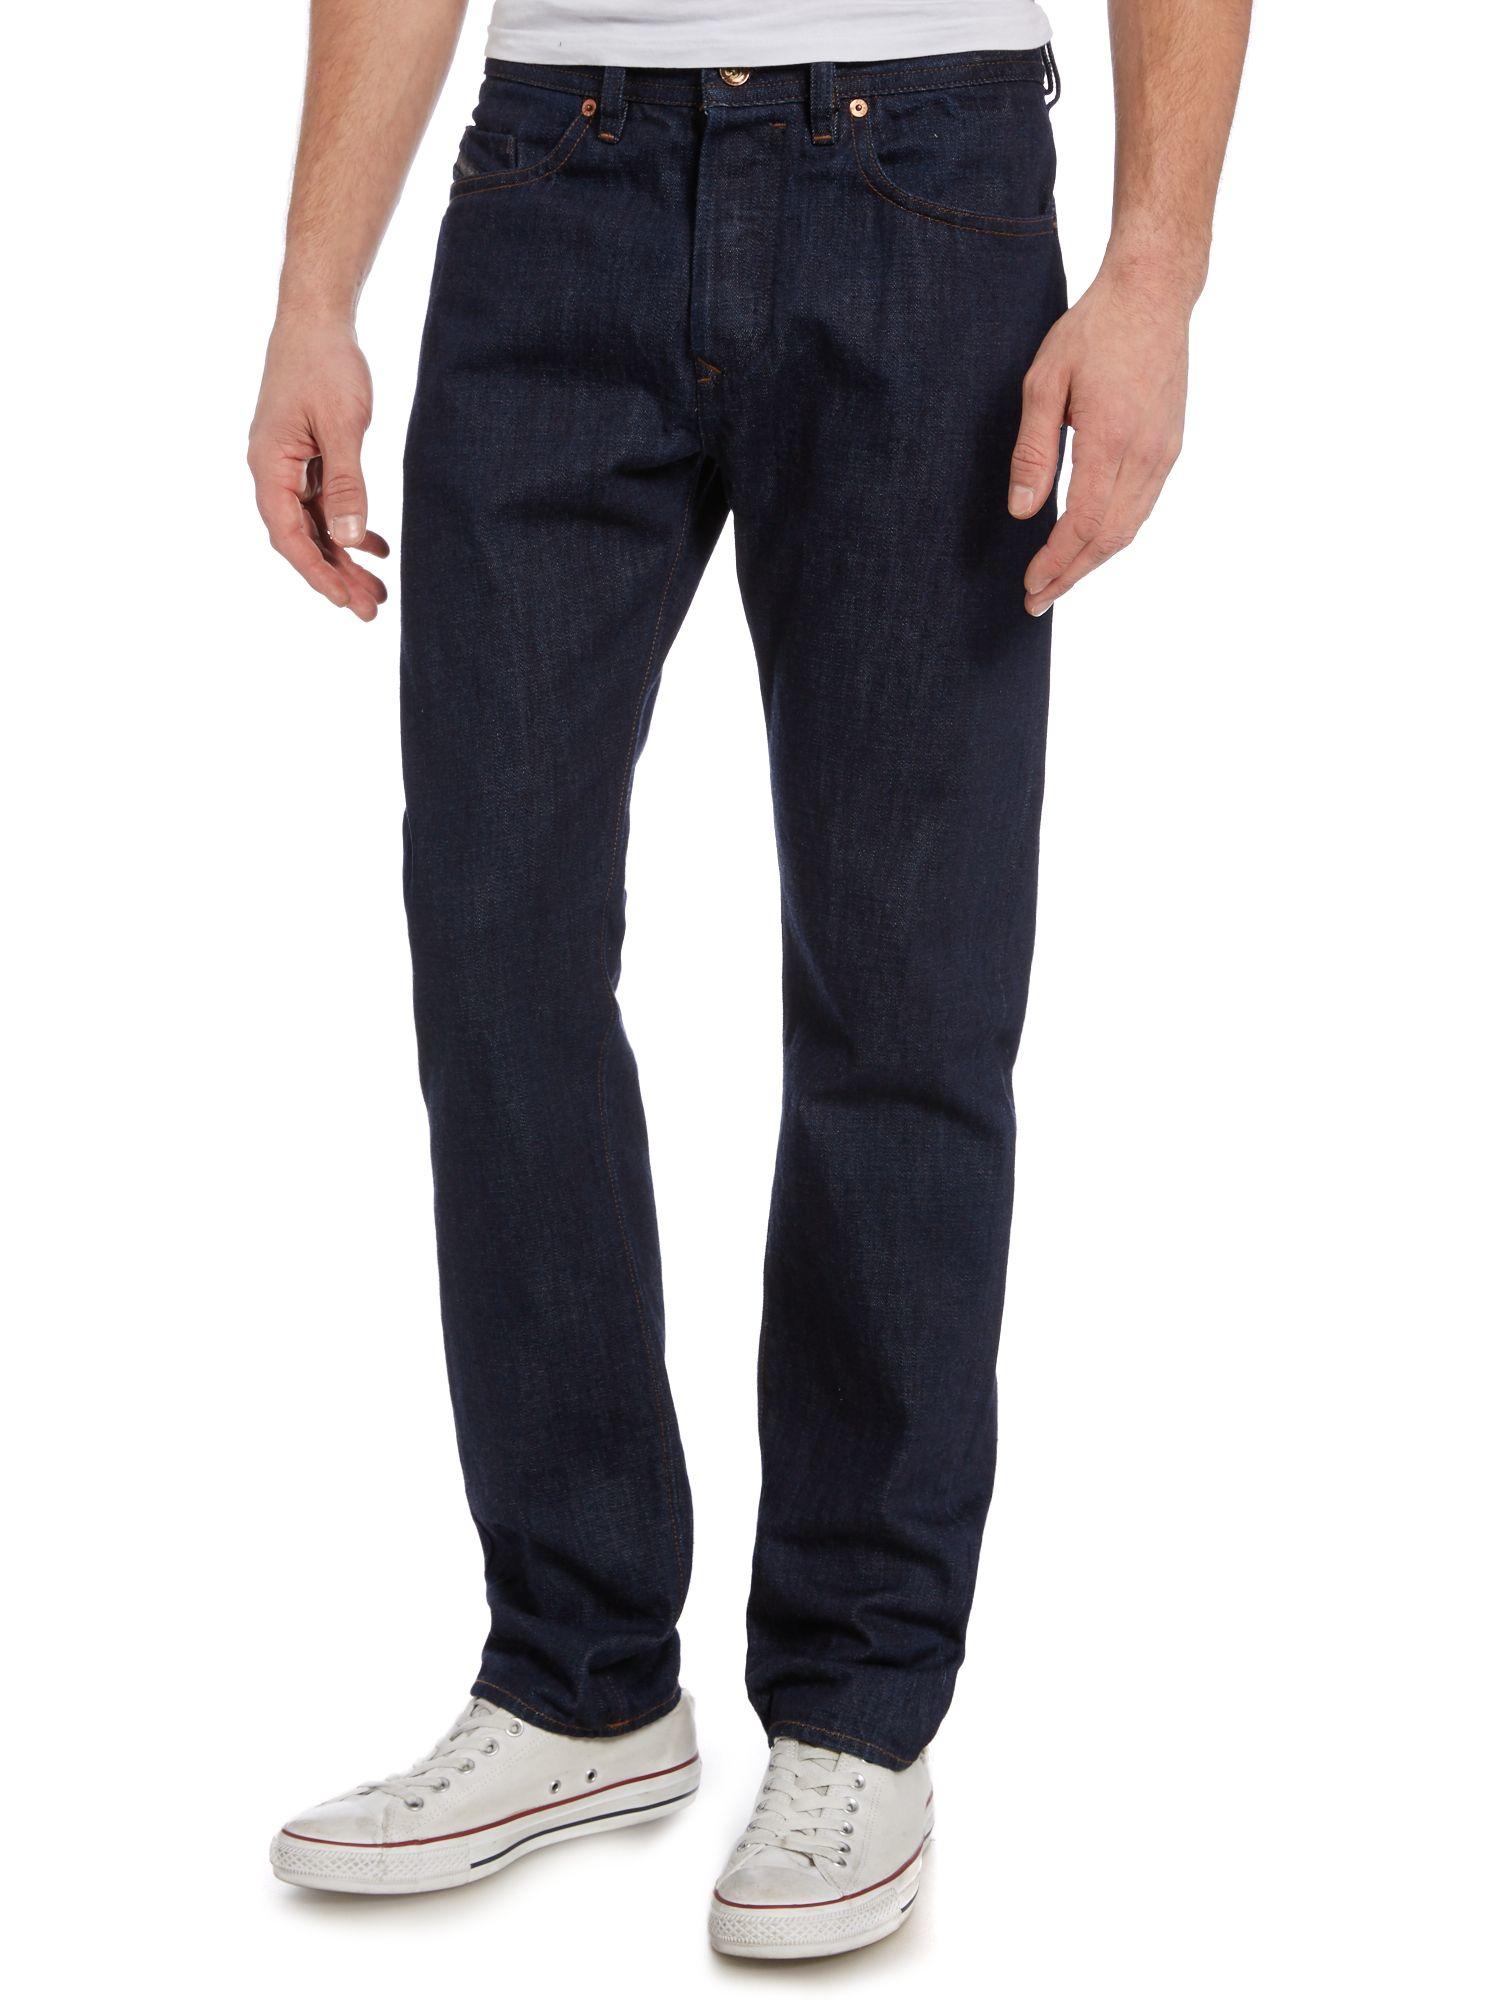 diesel buster 076c tapered fit stretch jeans in blue for men lyst. Black Bedroom Furniture Sets. Home Design Ideas